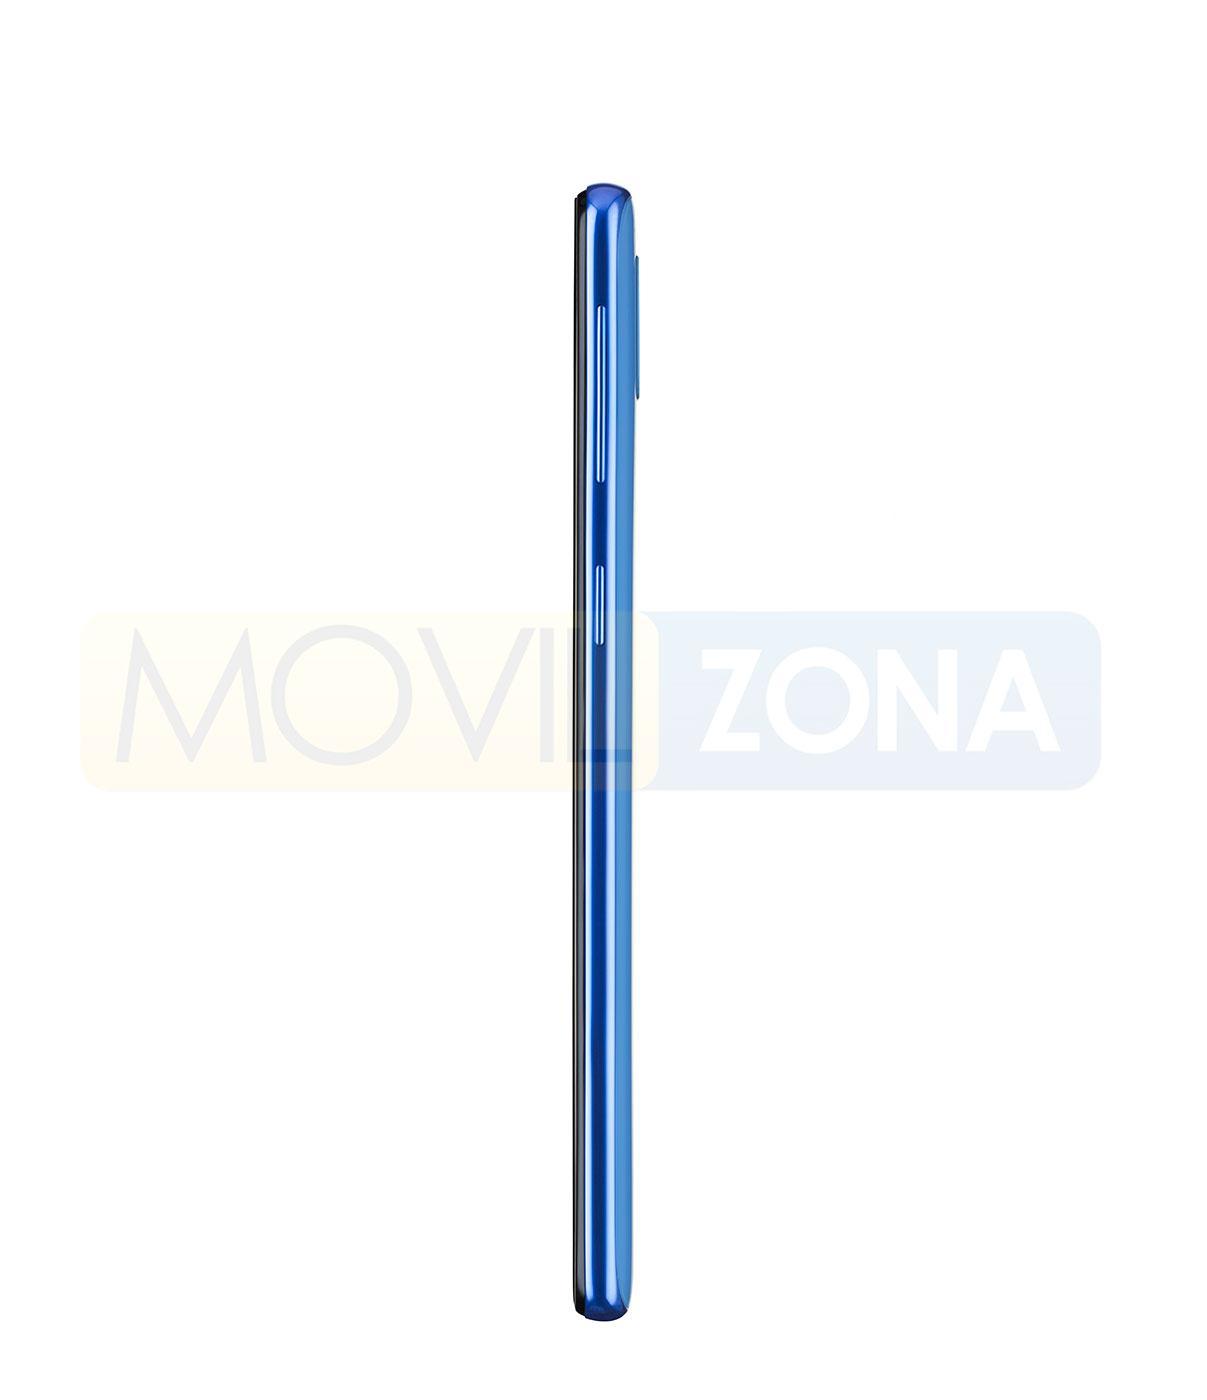 Samsung Galaxy A40 perfil 2